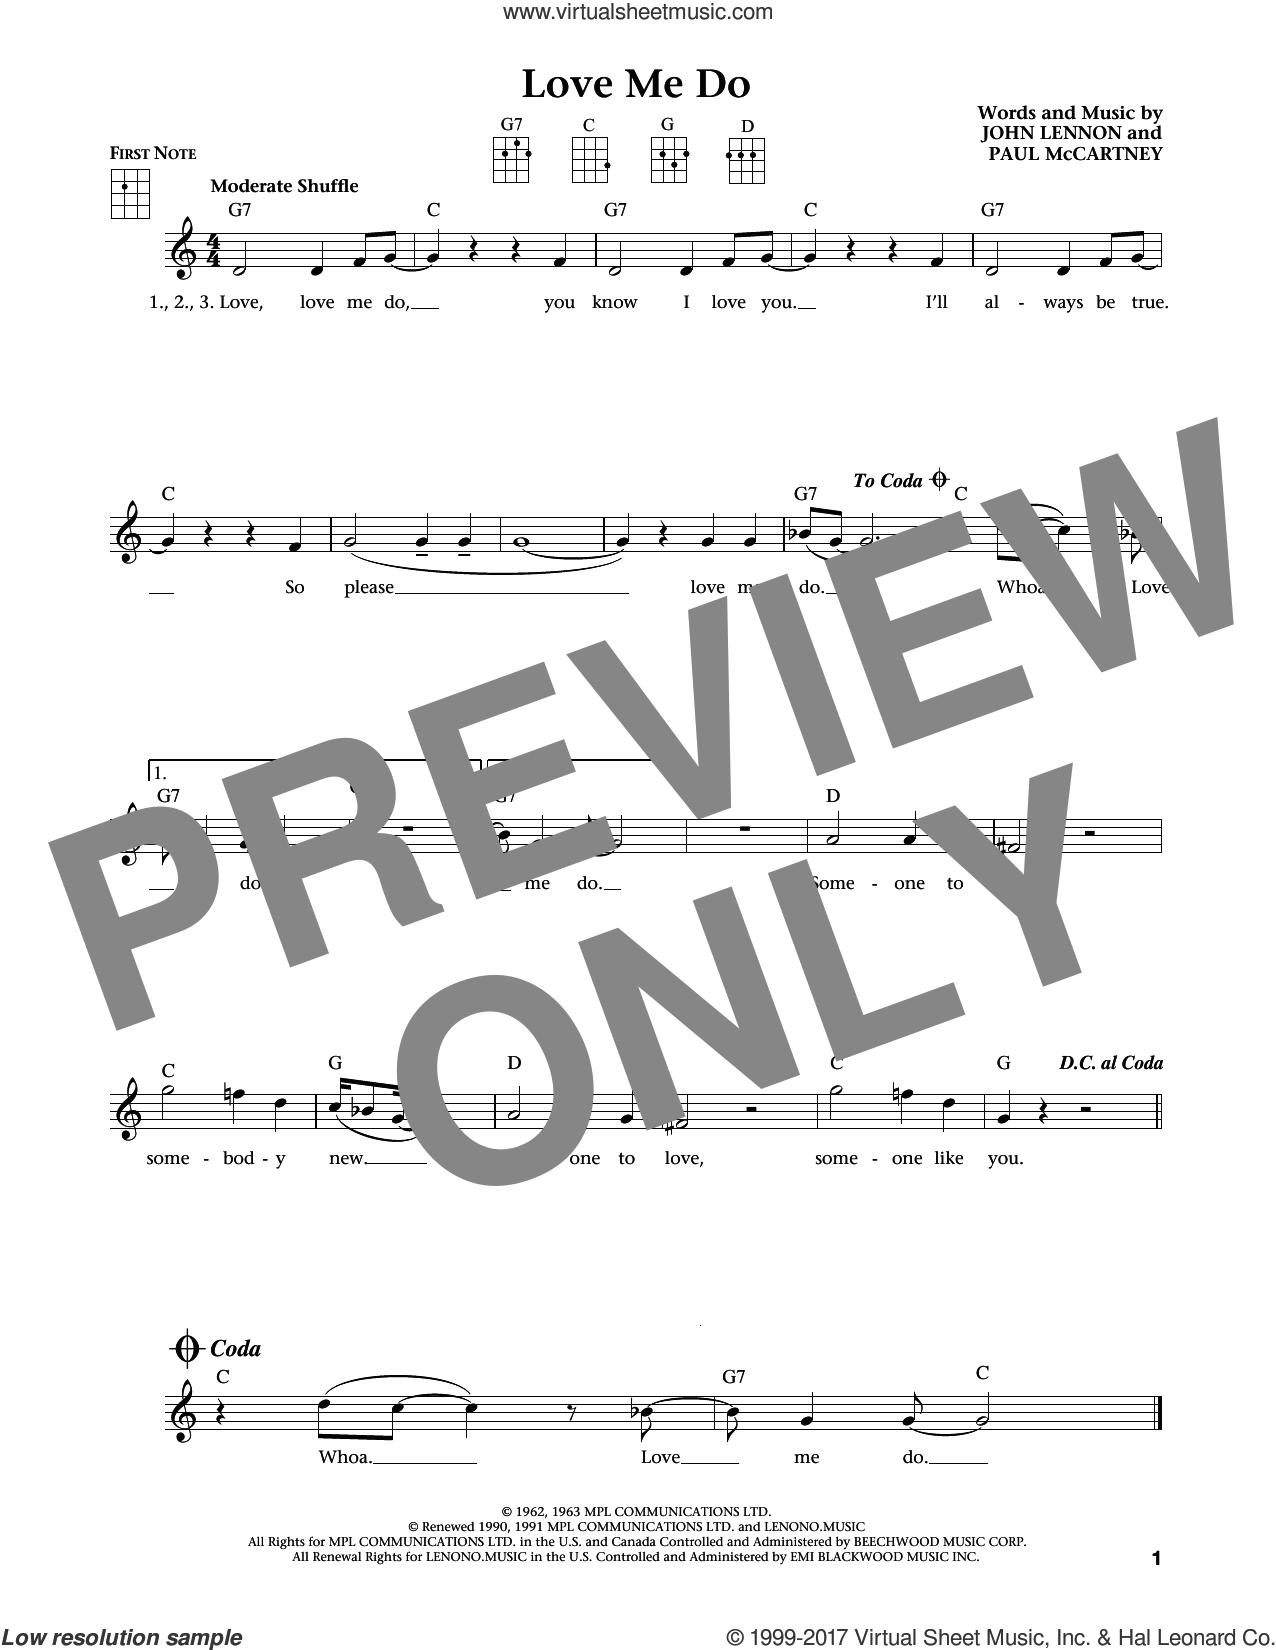 Love Me Do (from The Daily Ukulele) (arr. Liz and Jim Beloff) sheet music for ukulele by The Beatles, Jim Beloff, Liz Beloff, John Lennon and Paul McCartney, intermediate skill level